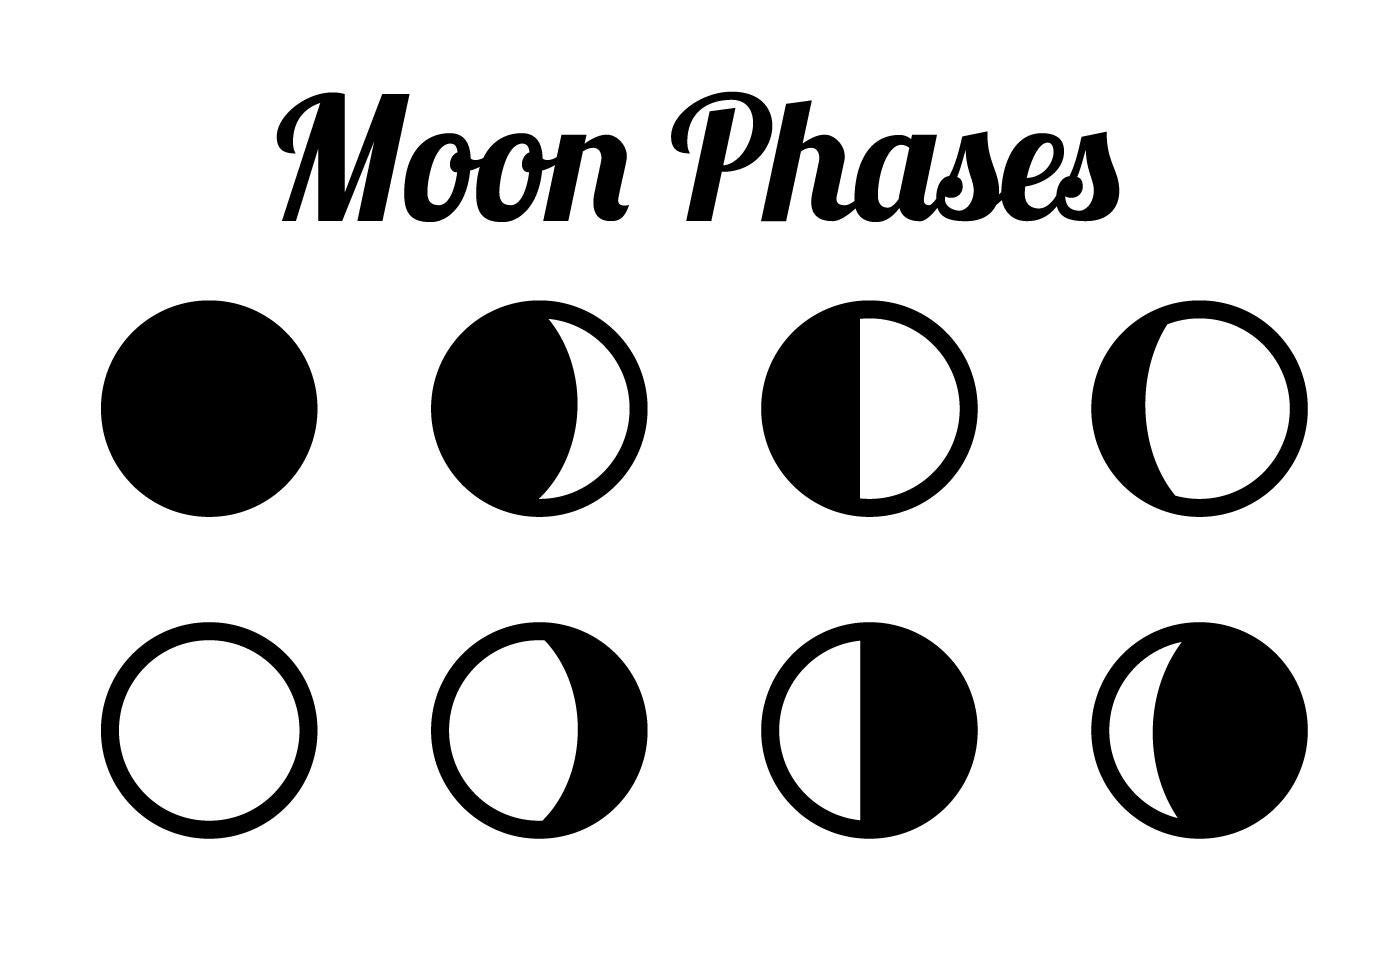 printable worksheets moon phases - HD1400×980